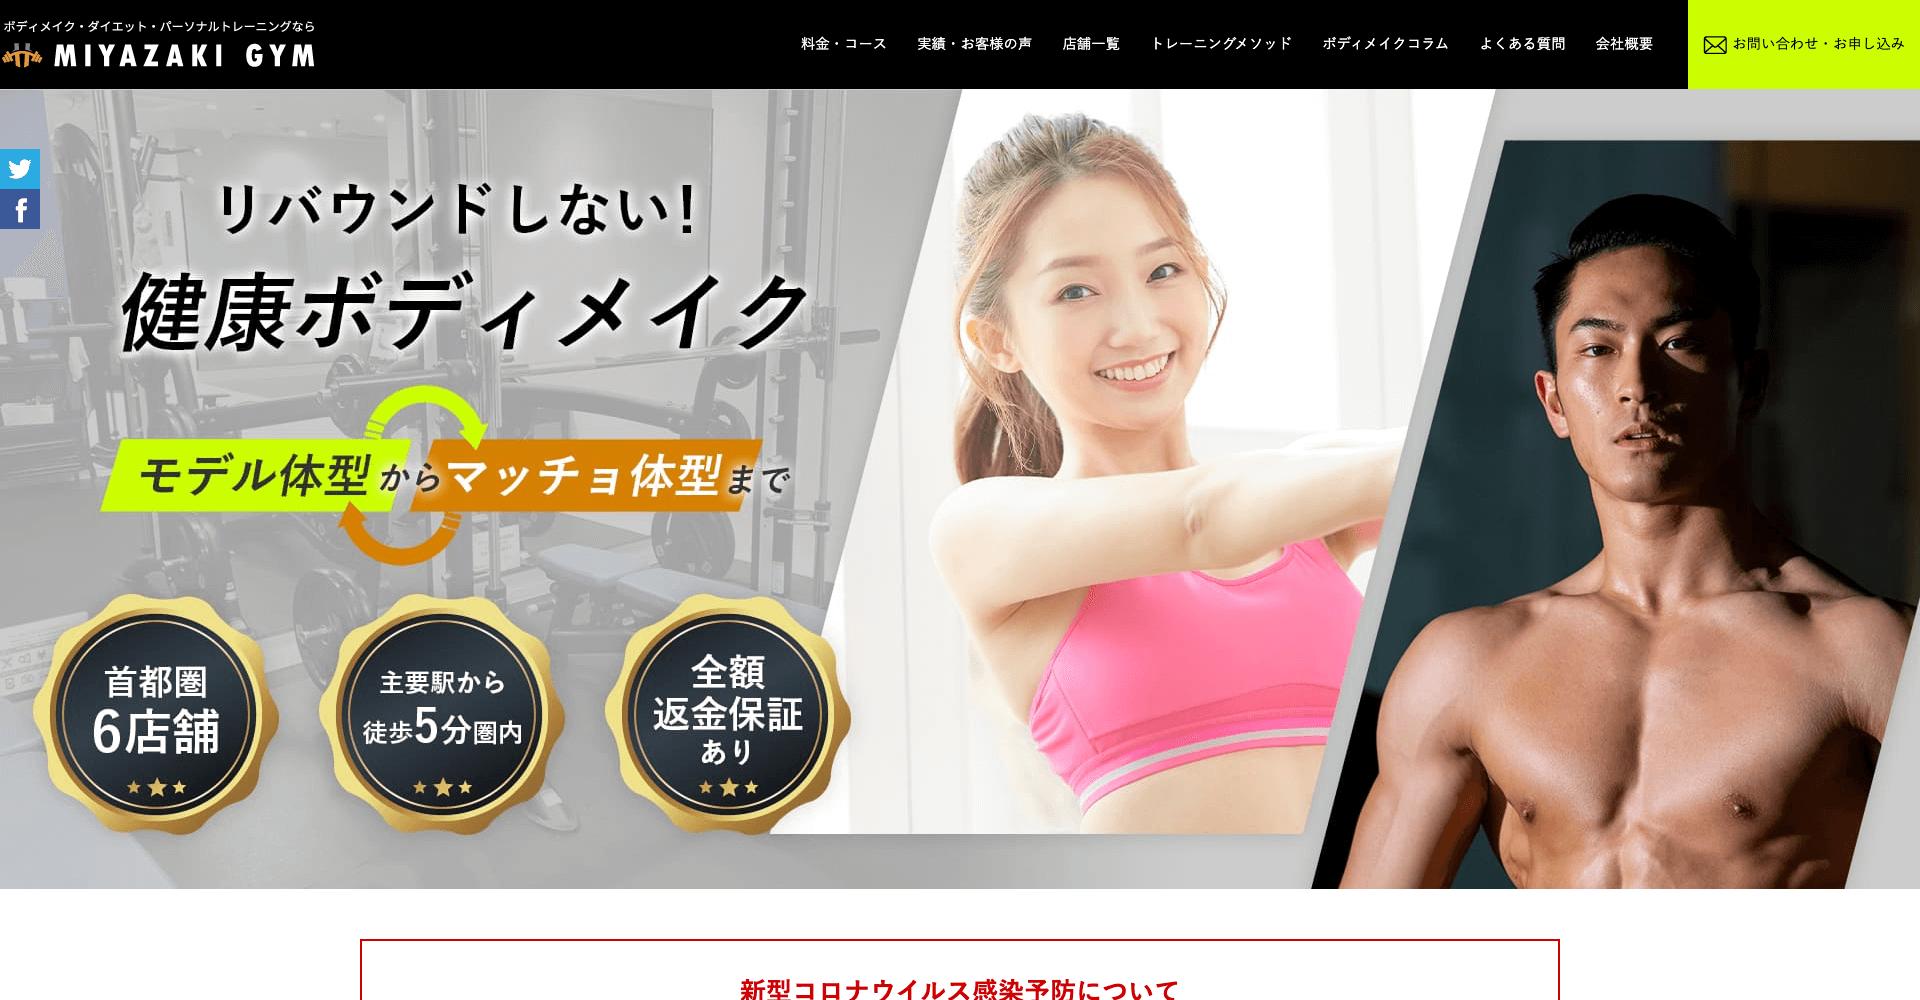 MIYAZAKI PRIVATE GYM 武蔵小杉店